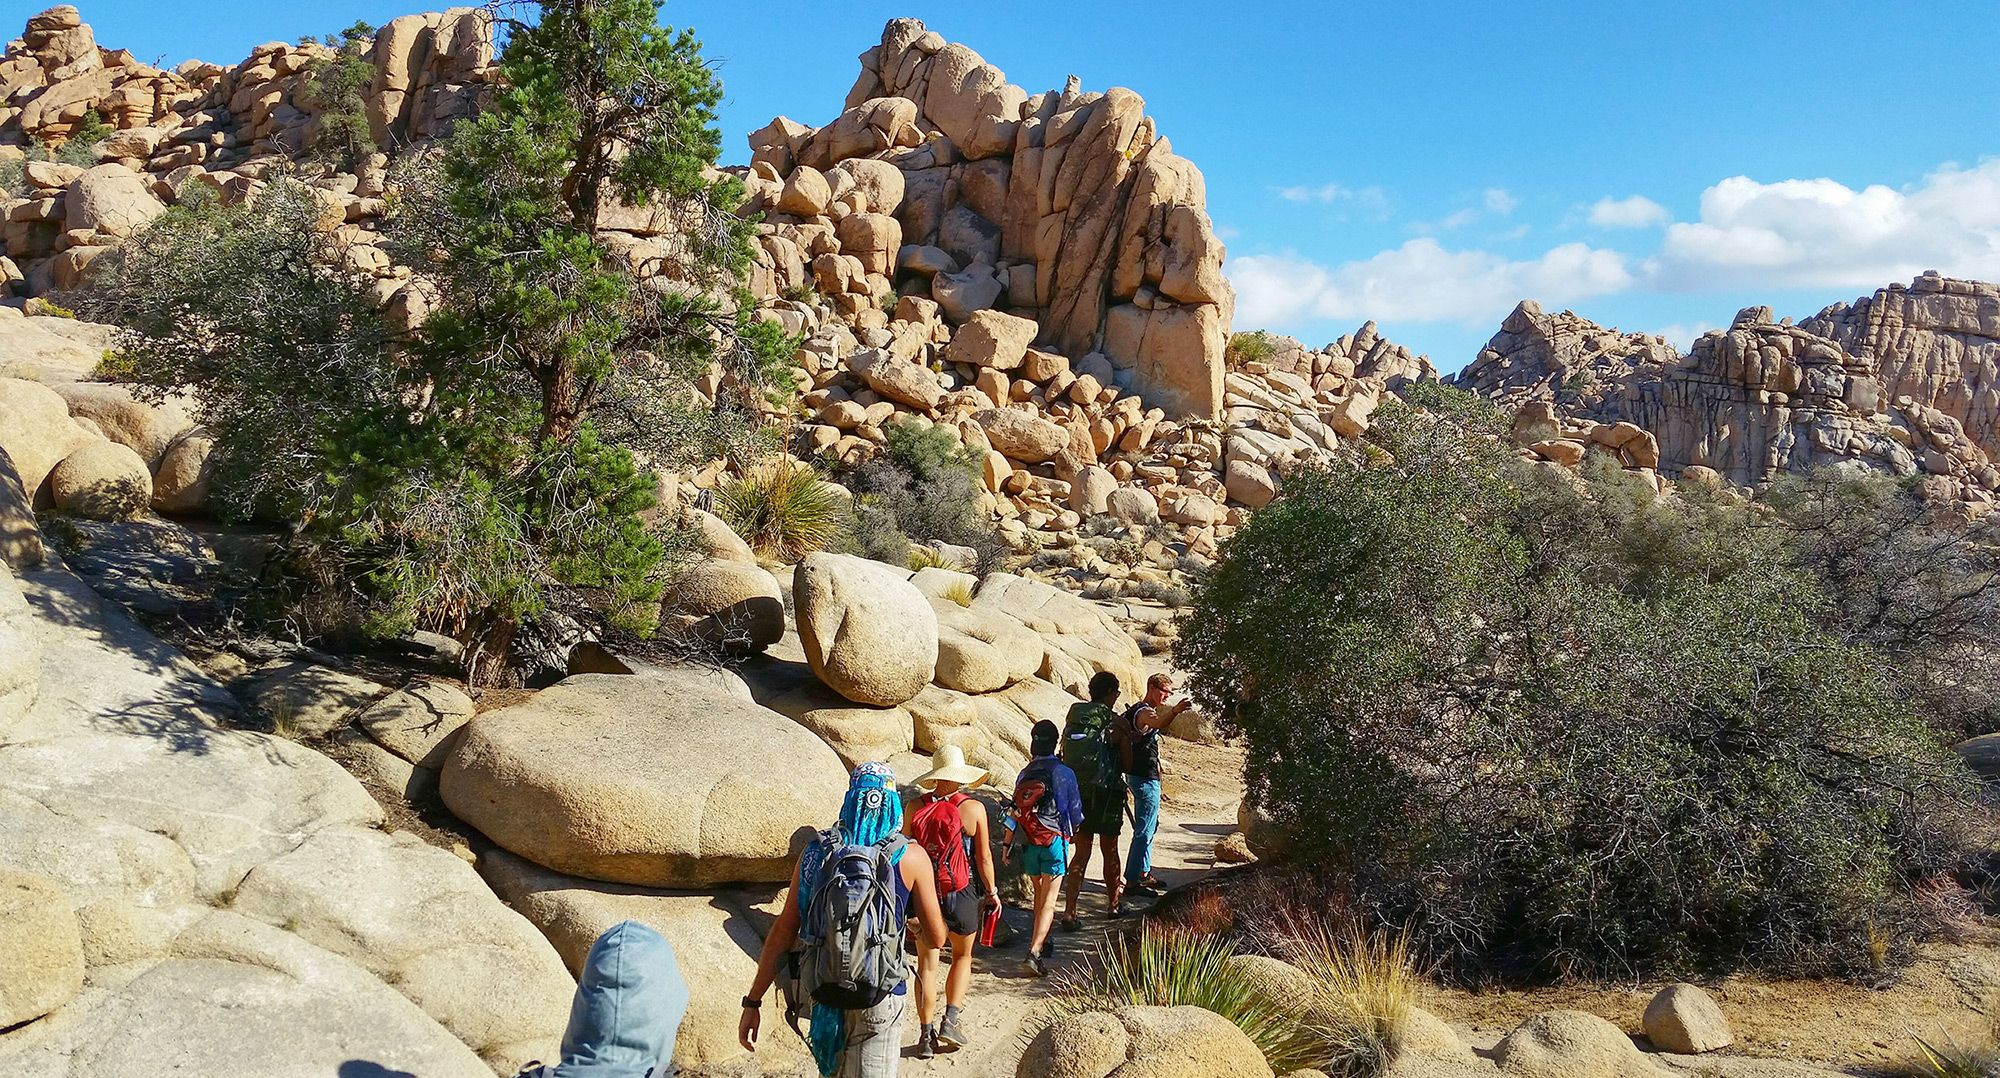 Naturalists at Large, Backpacking